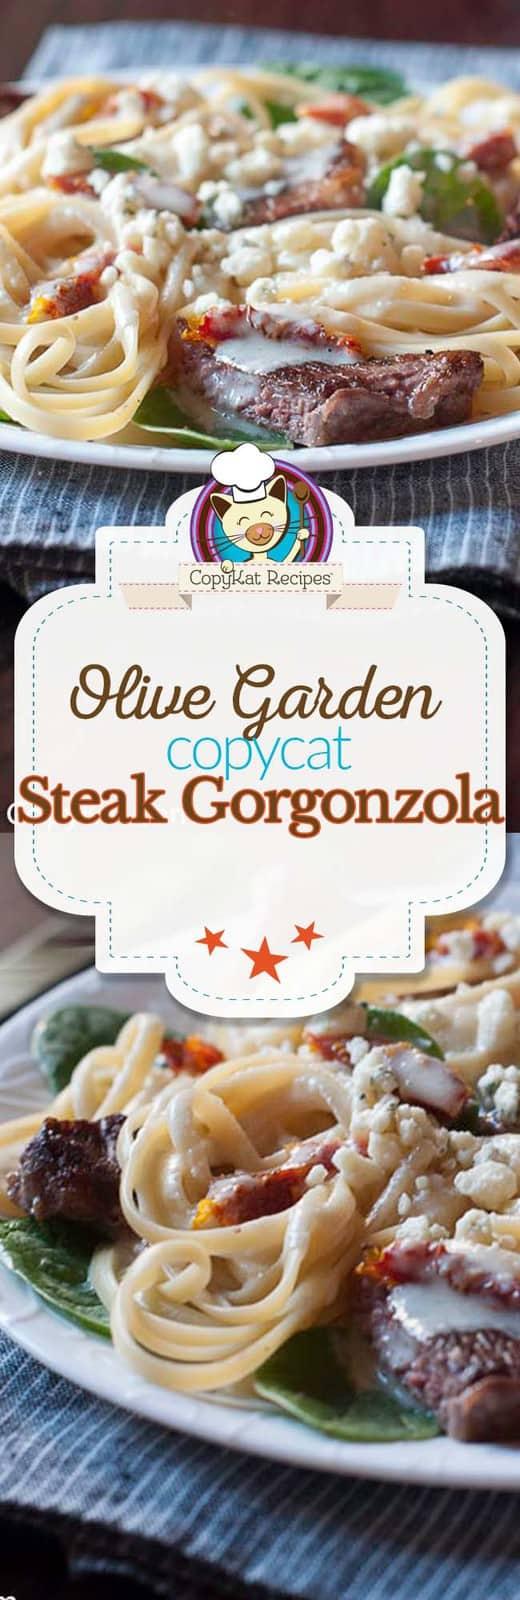 Make the Olive Garden Steak Gorgonzola Alfredo.  You will love this copycat recipe.